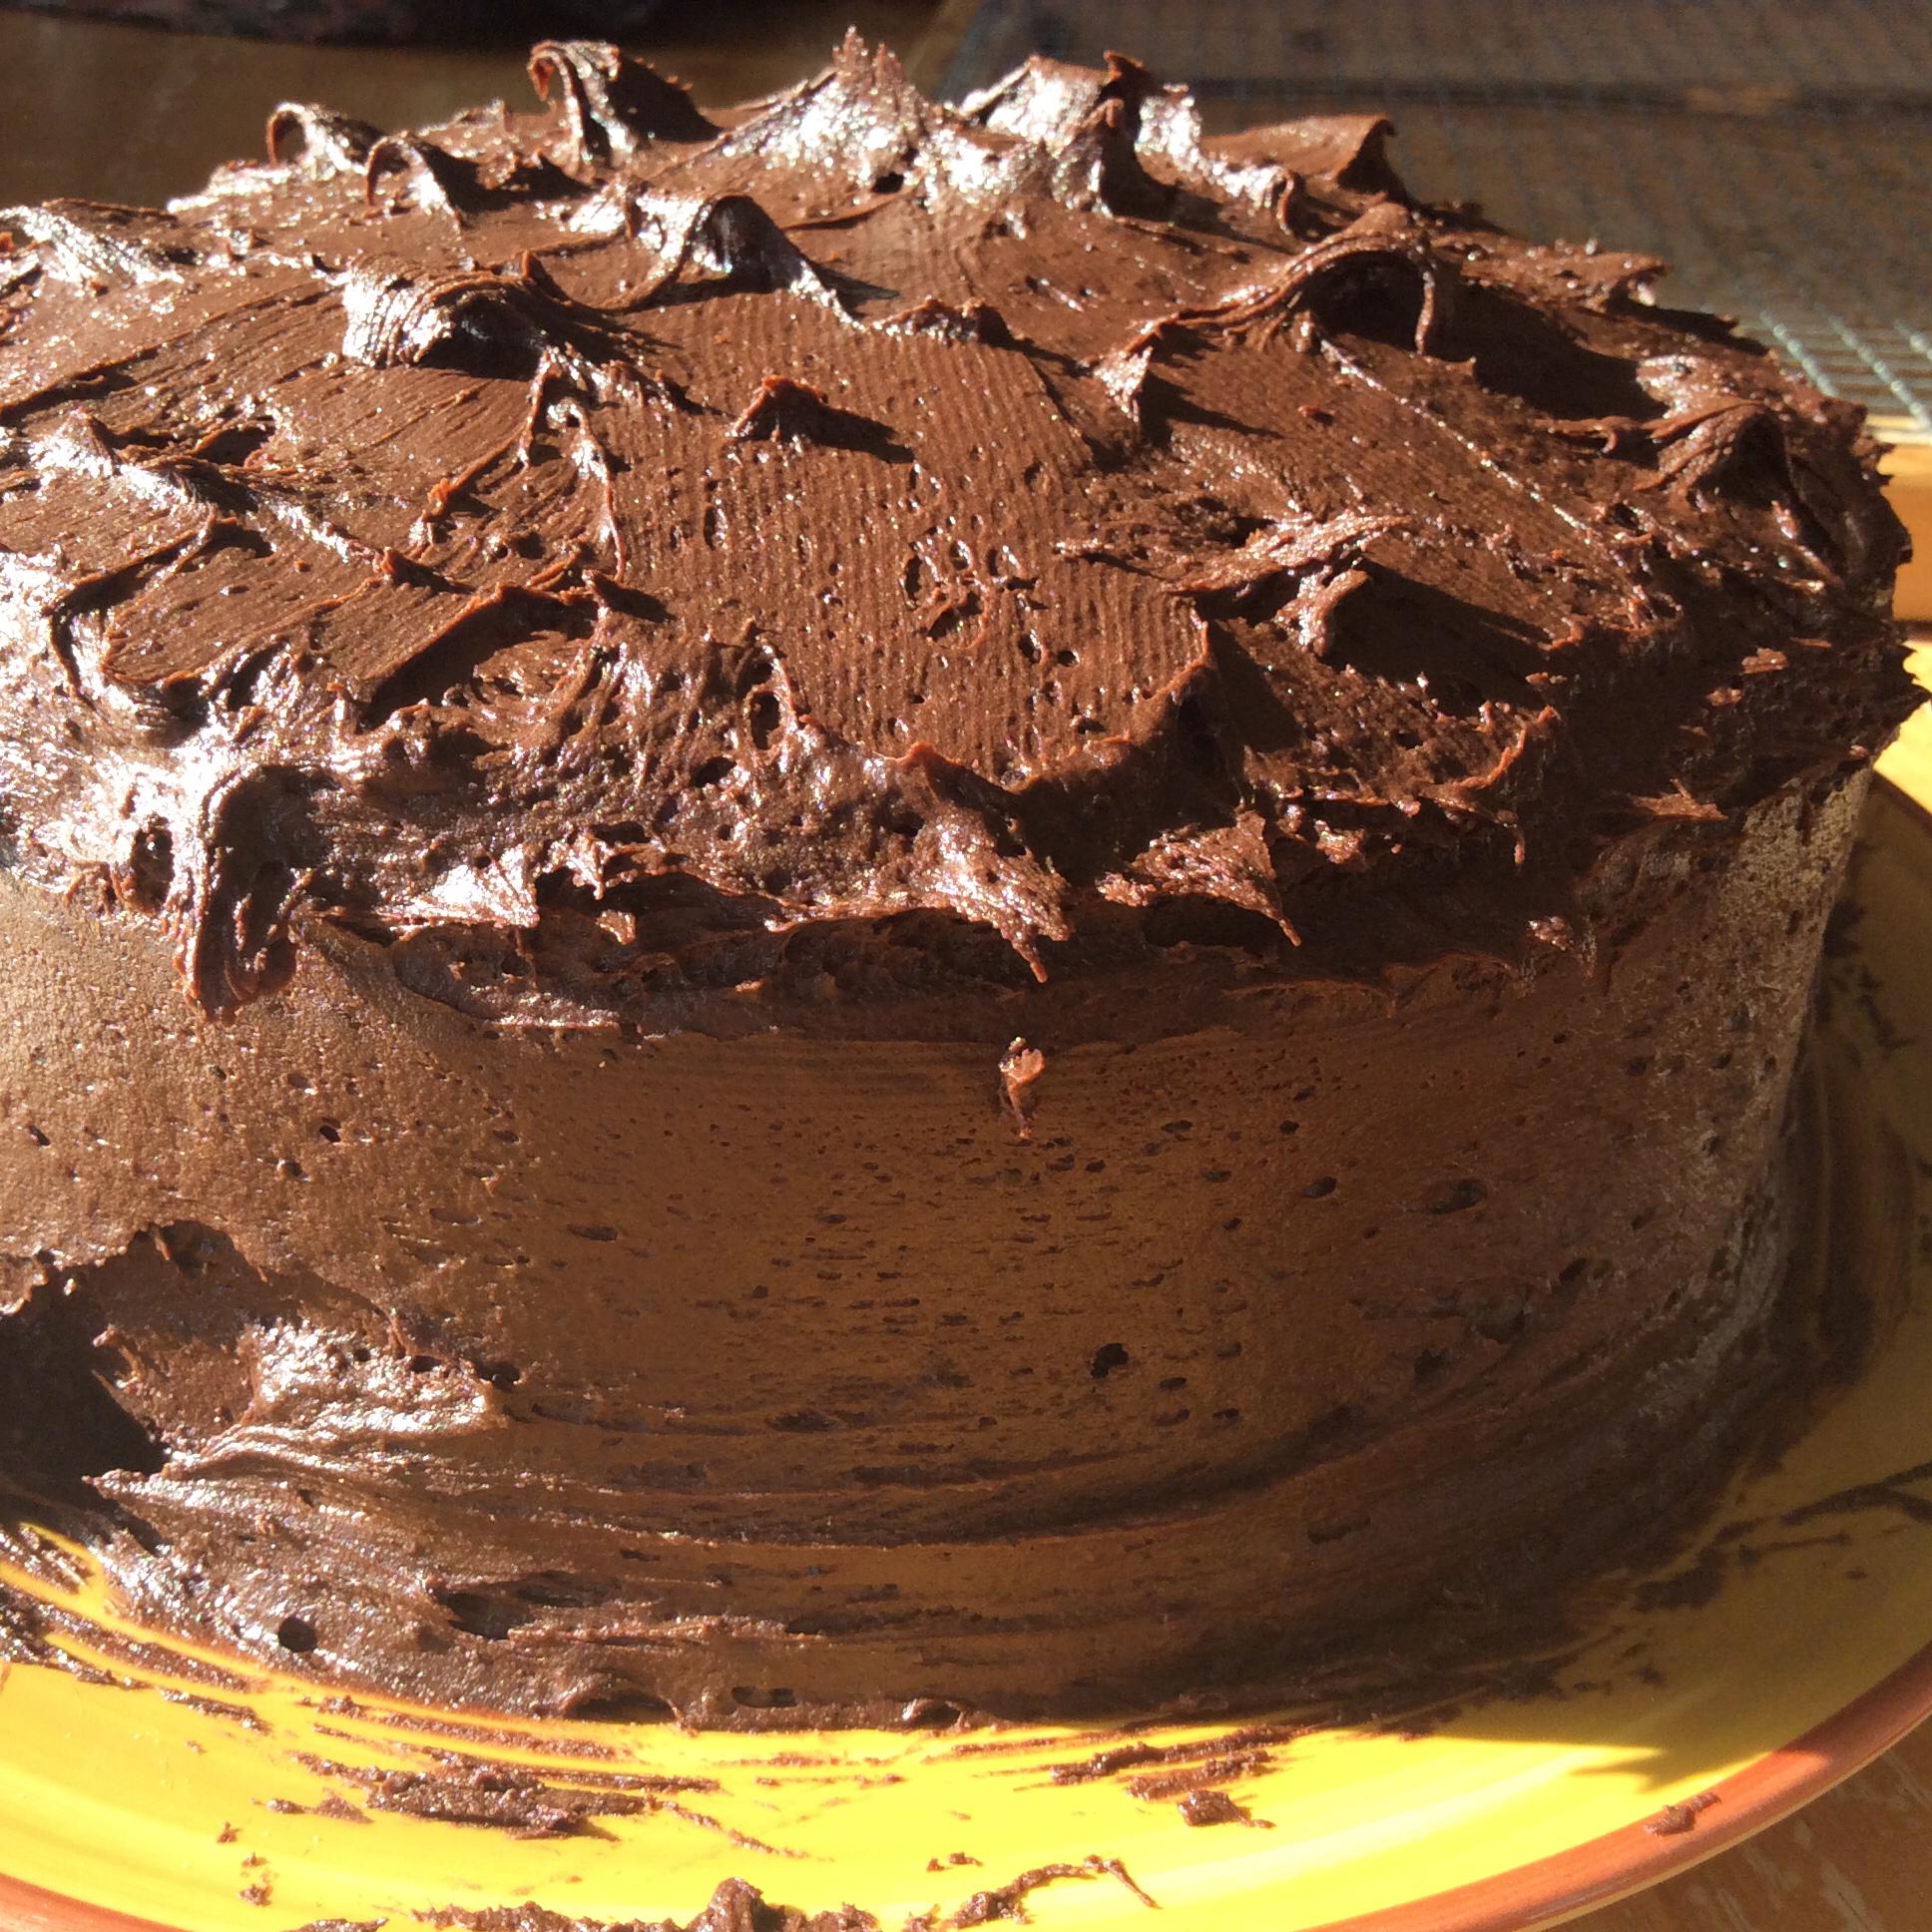 Best Chocolate Frosting Crabbiguy